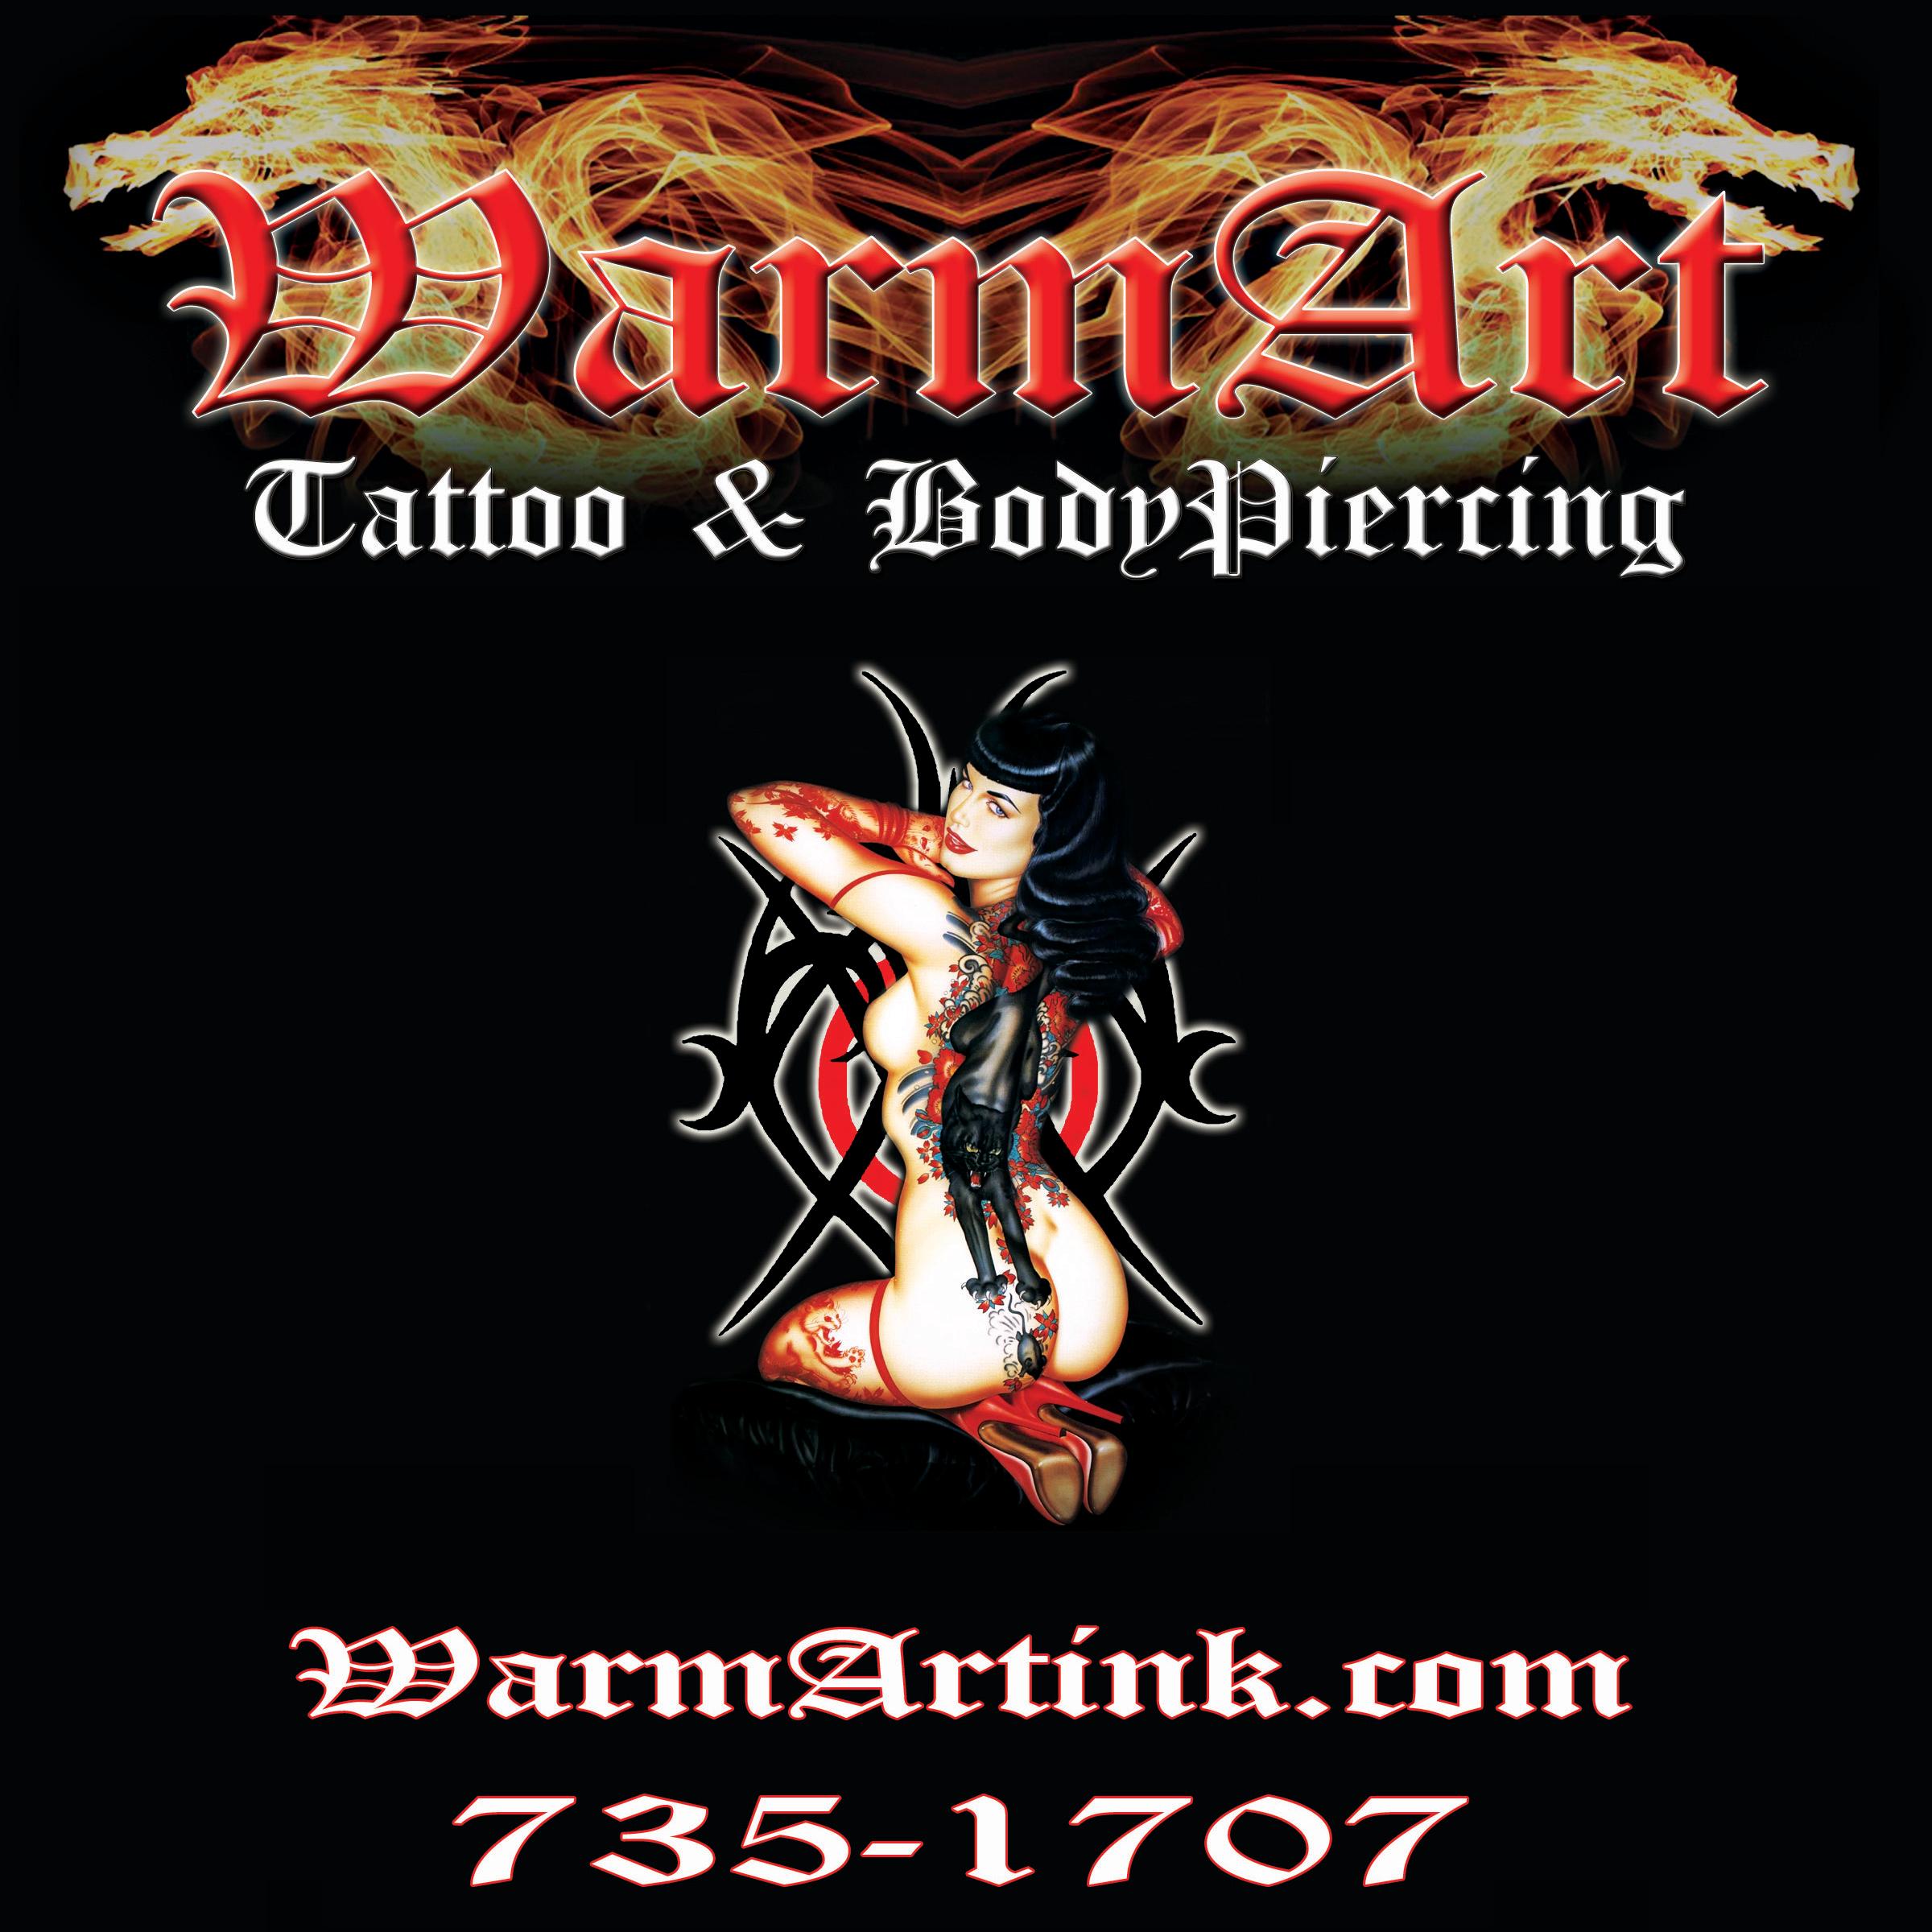 warm art tattoo body piercing in twin falls id 208 735 1707